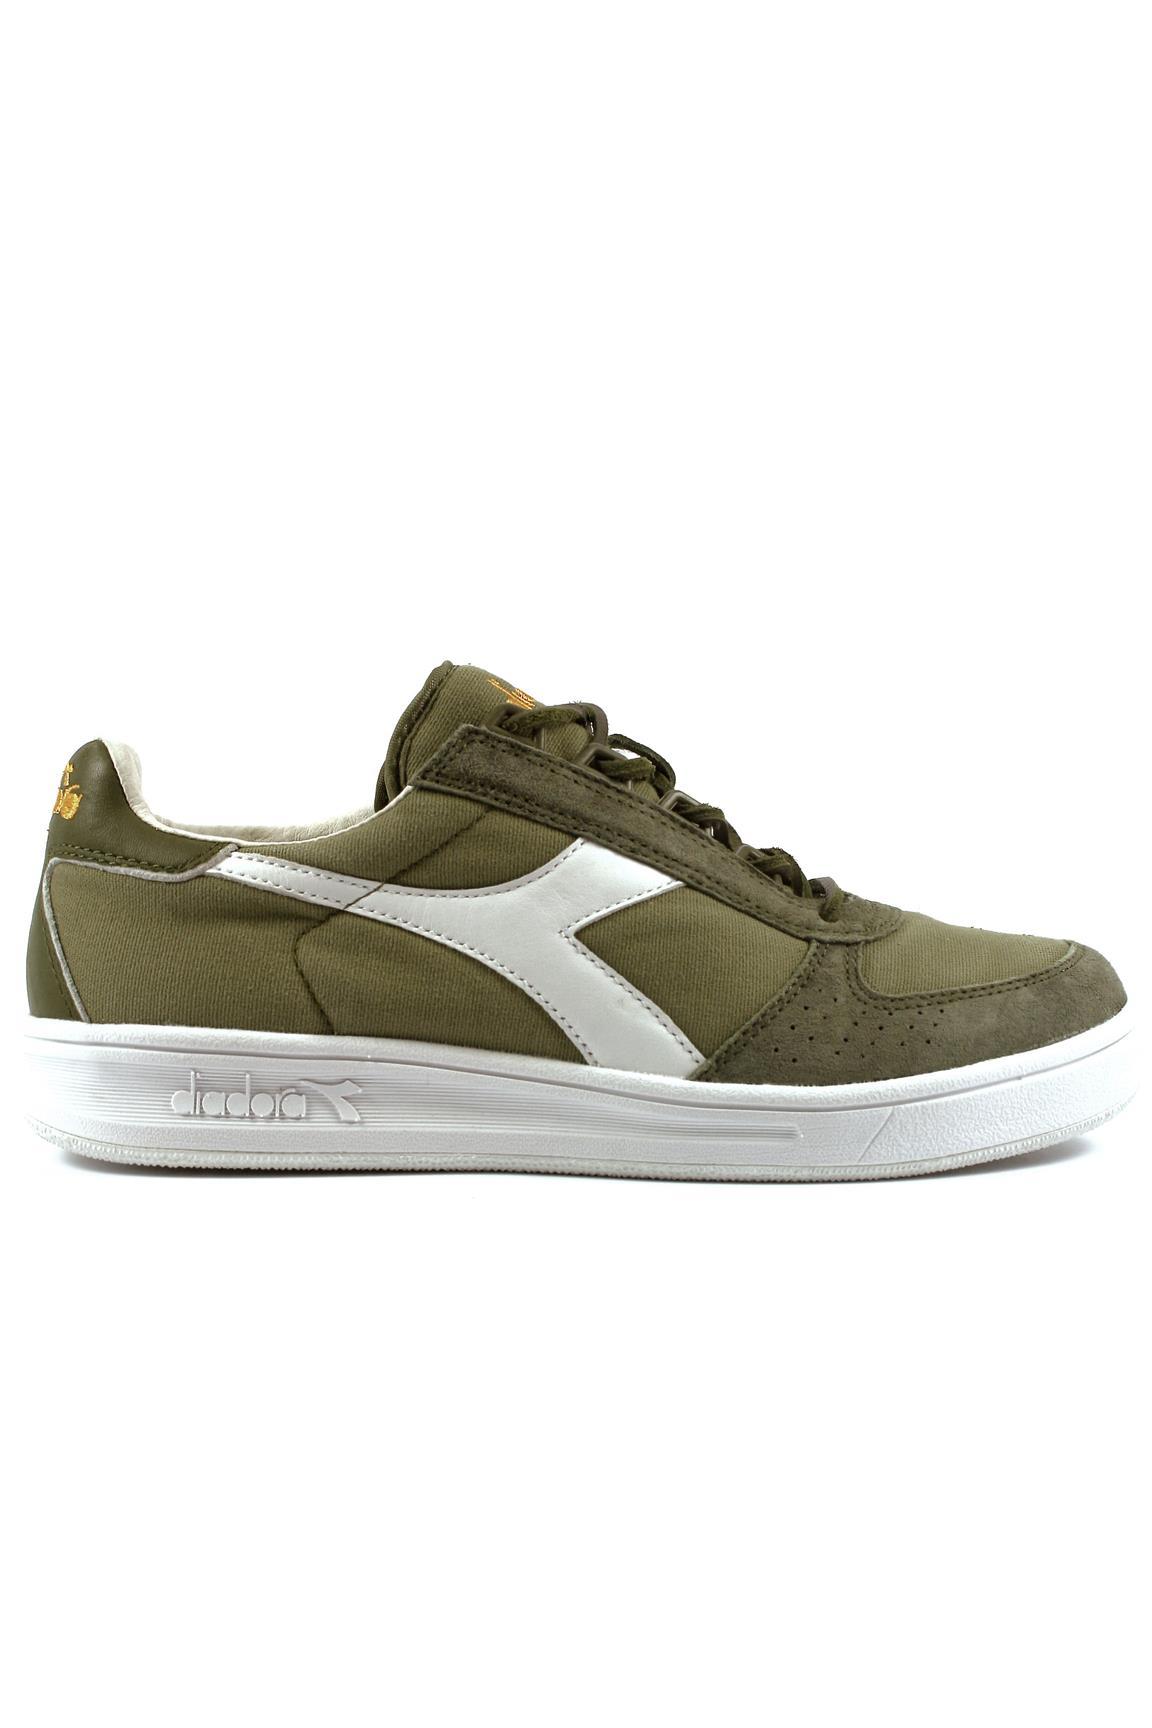 DIADORA heritage buy online shop shoes men women - 6ba84c9b17